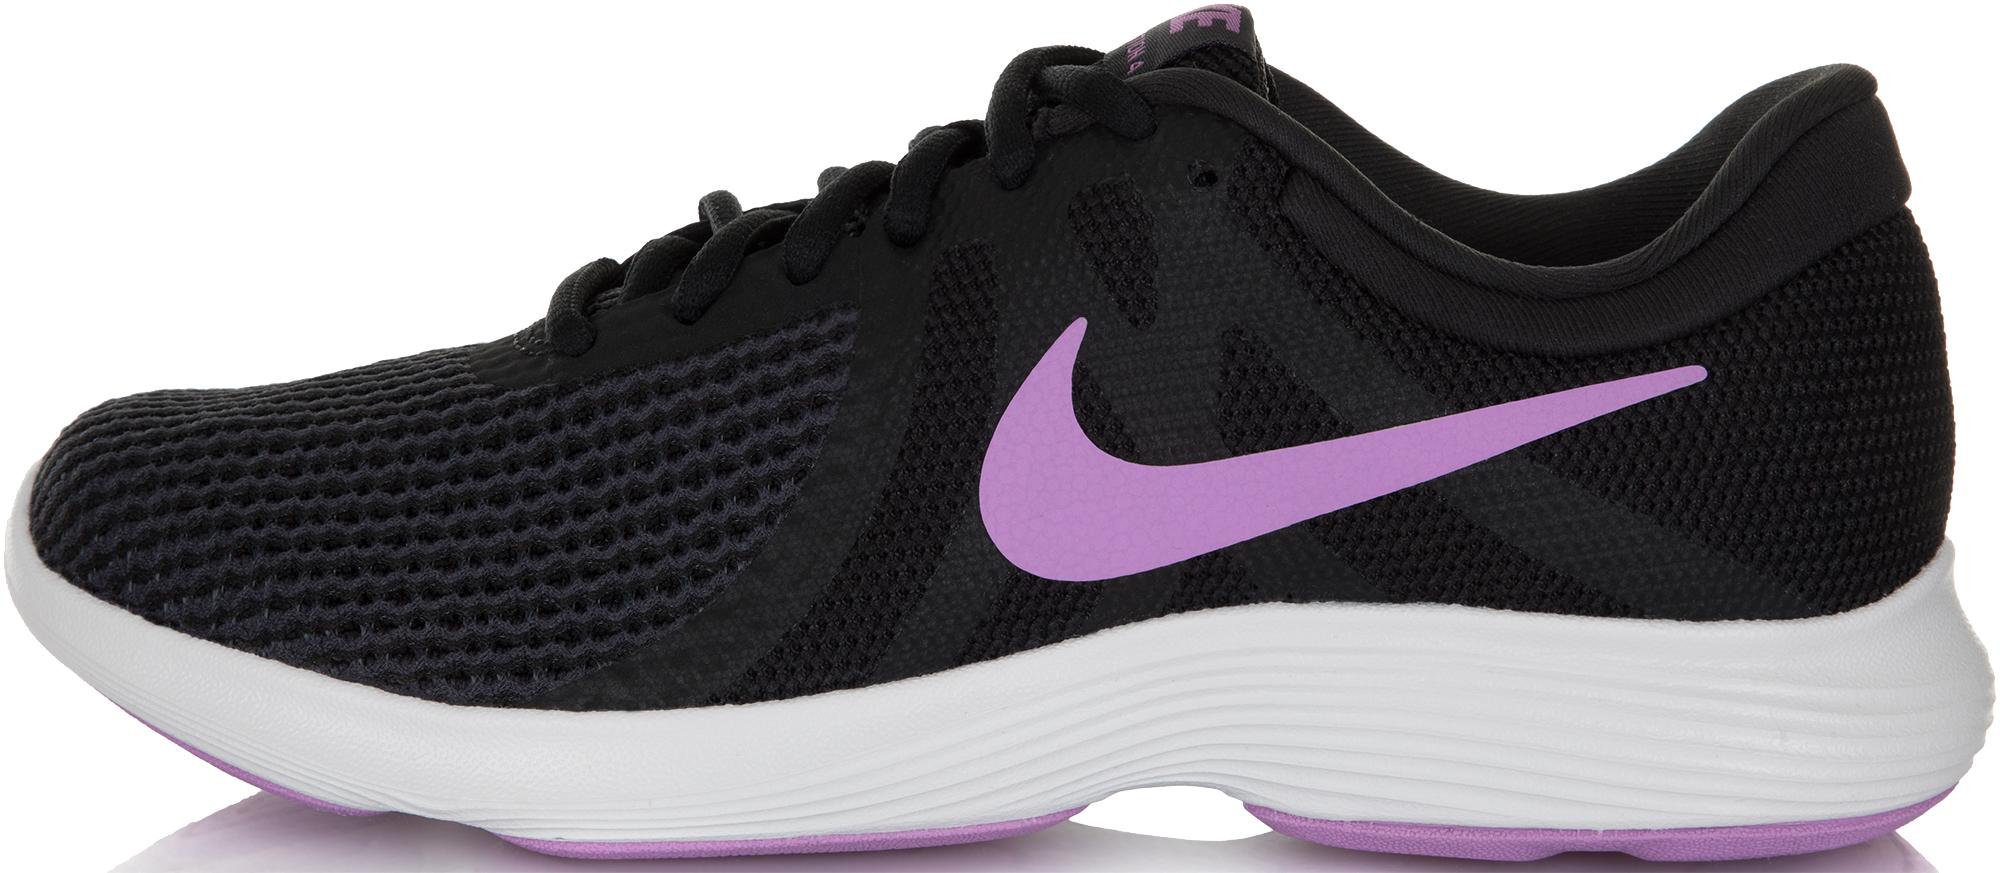 Nike Кроссовки женские Nike Revolution 4, размер 38 цена